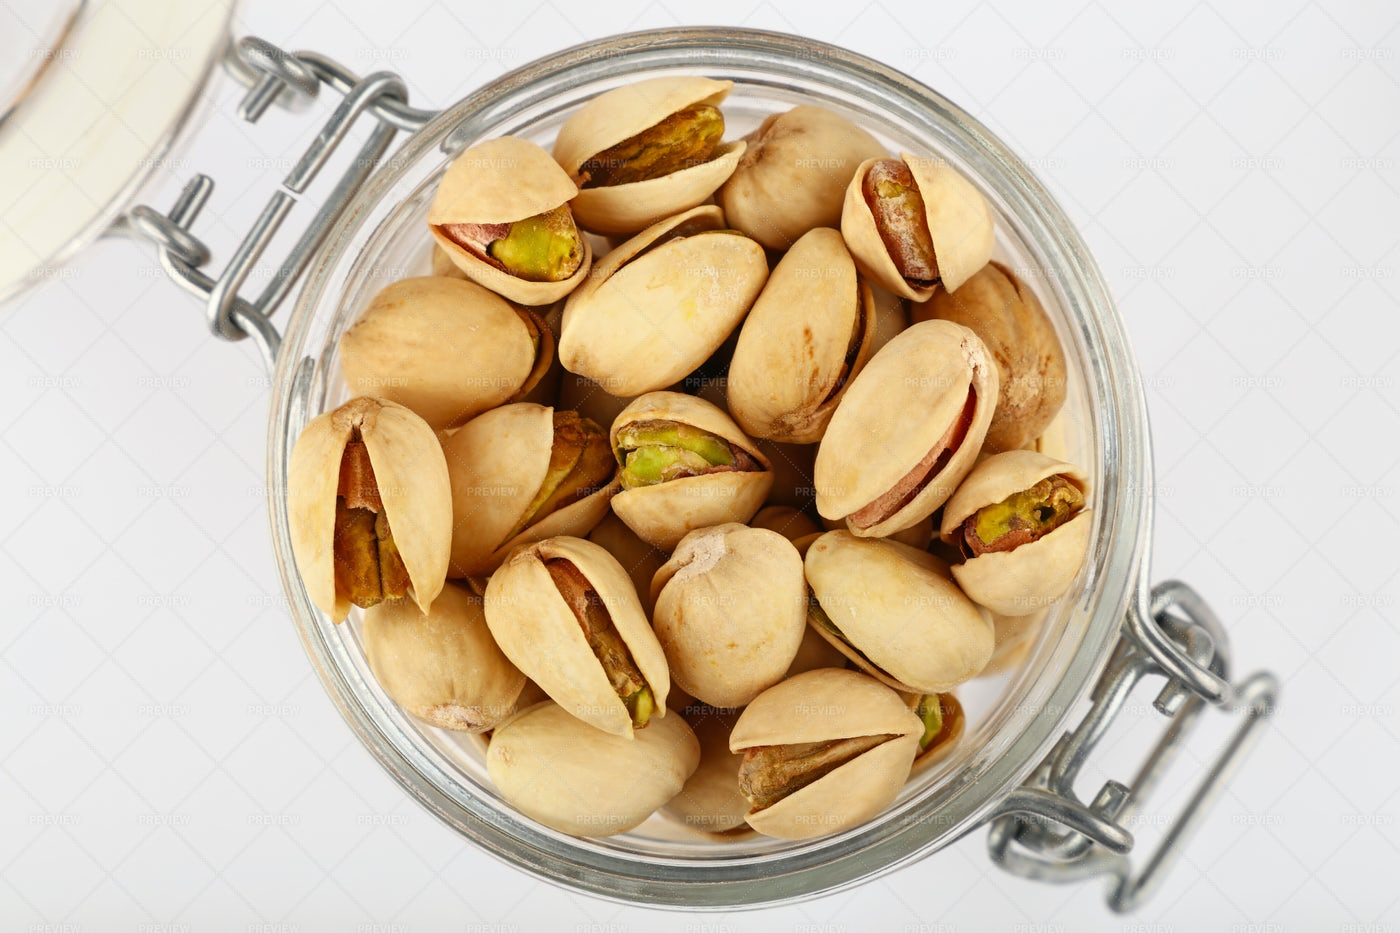 Pistachio Nuts In Jar: Stock Photos